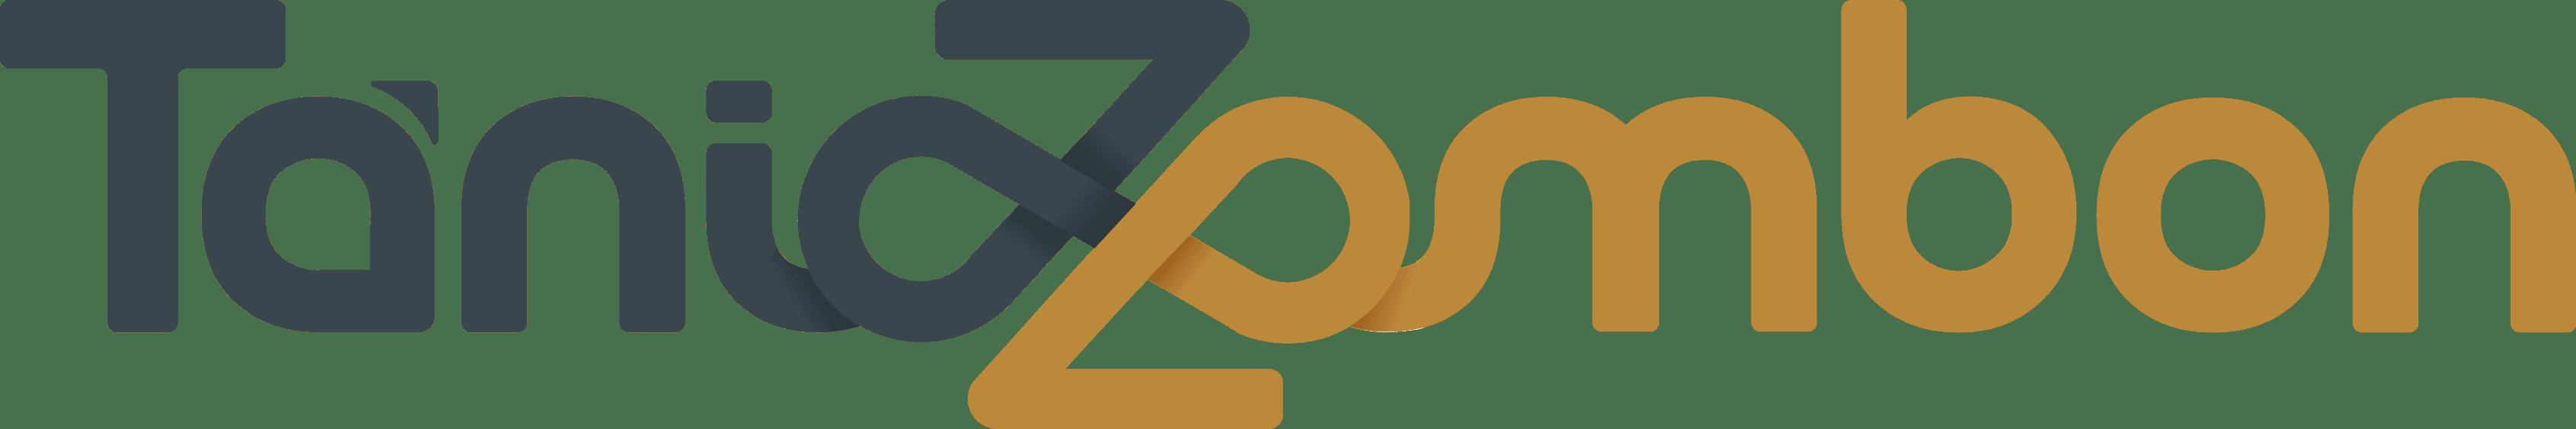 tania-zambon-logo